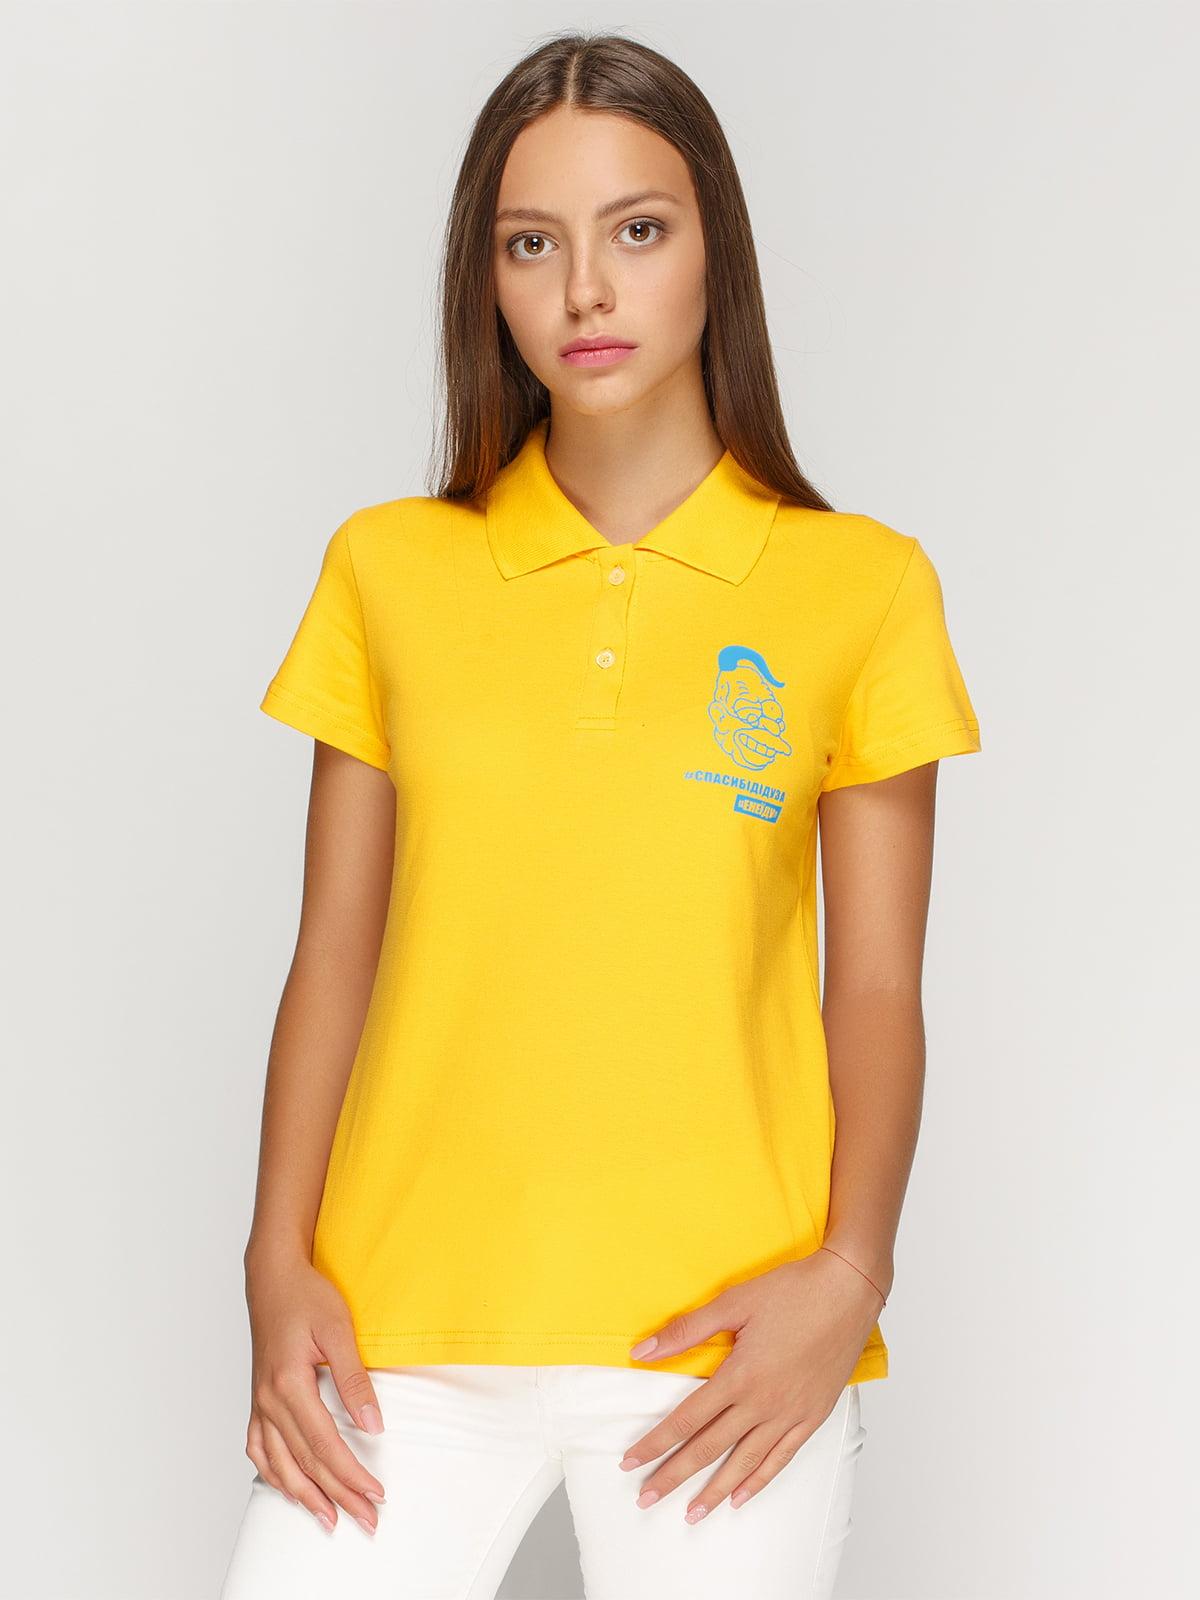 Футболка-поло жовта з принтом | 4578479